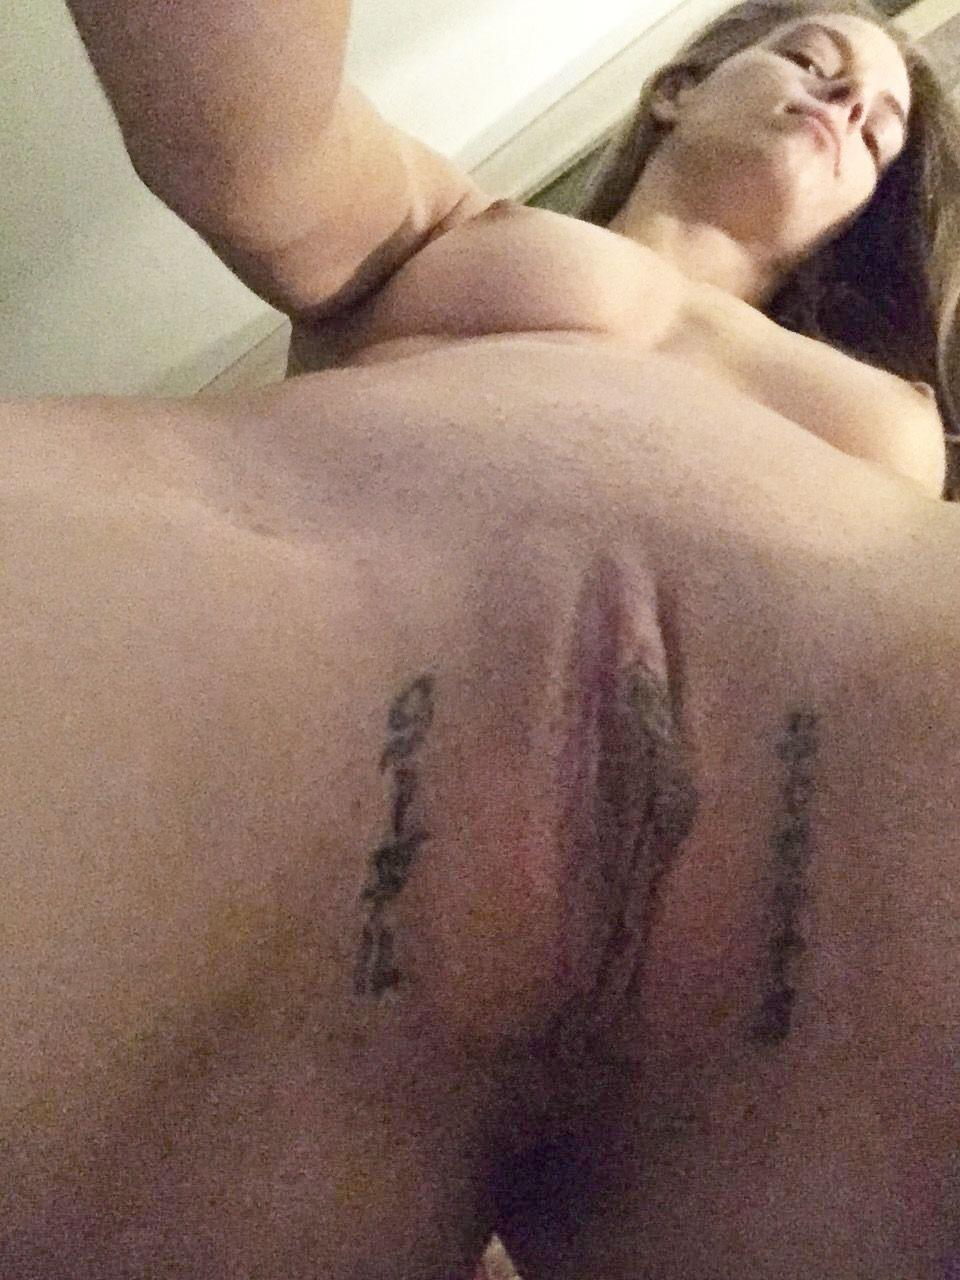 Jessamyn duke nude pics